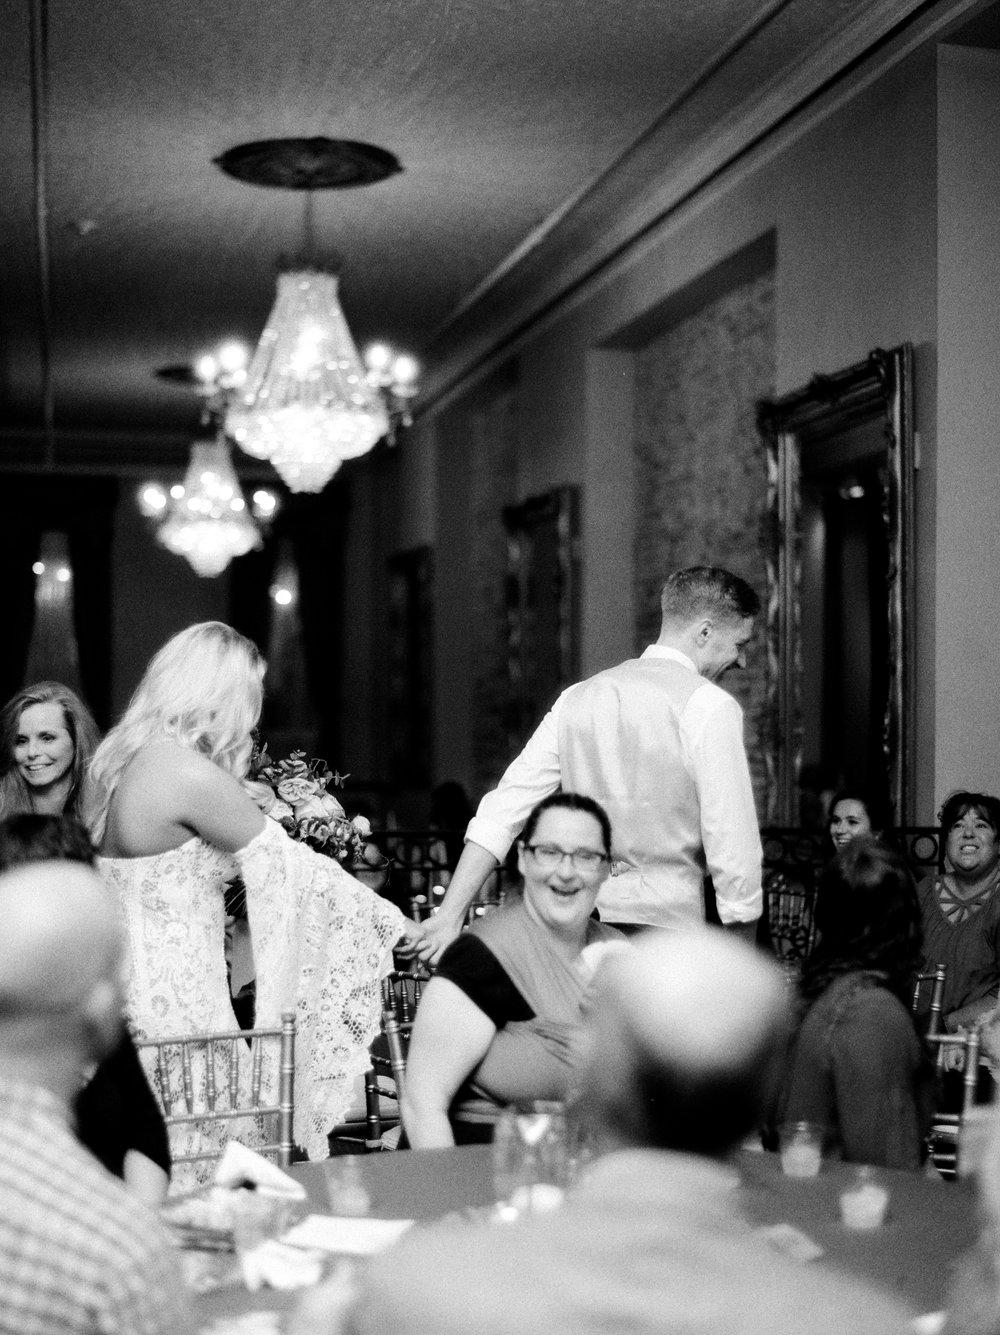 grandonfoster-wedding-venue-kayliebpoplinphotography